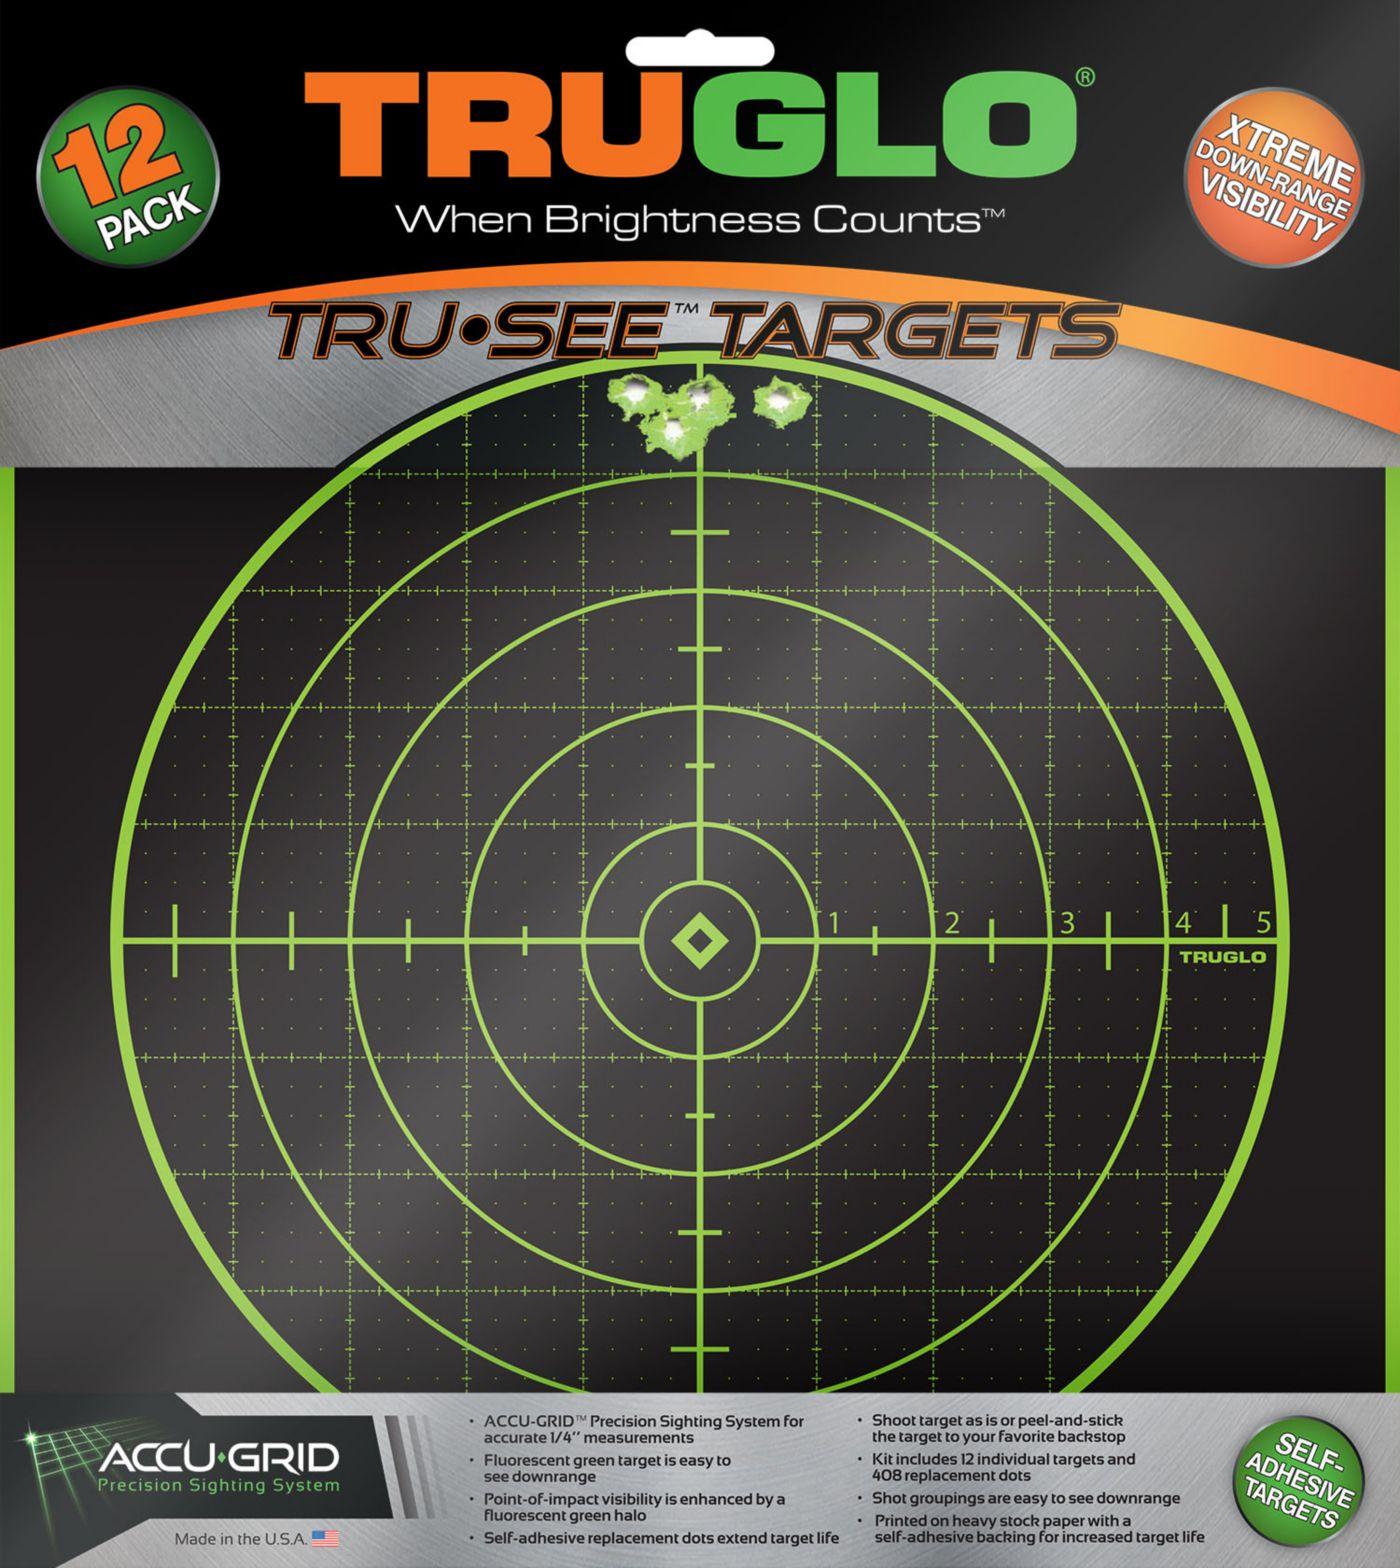 TRUGLO Tru-See Splatter 100-Yard Target – 12 Pack